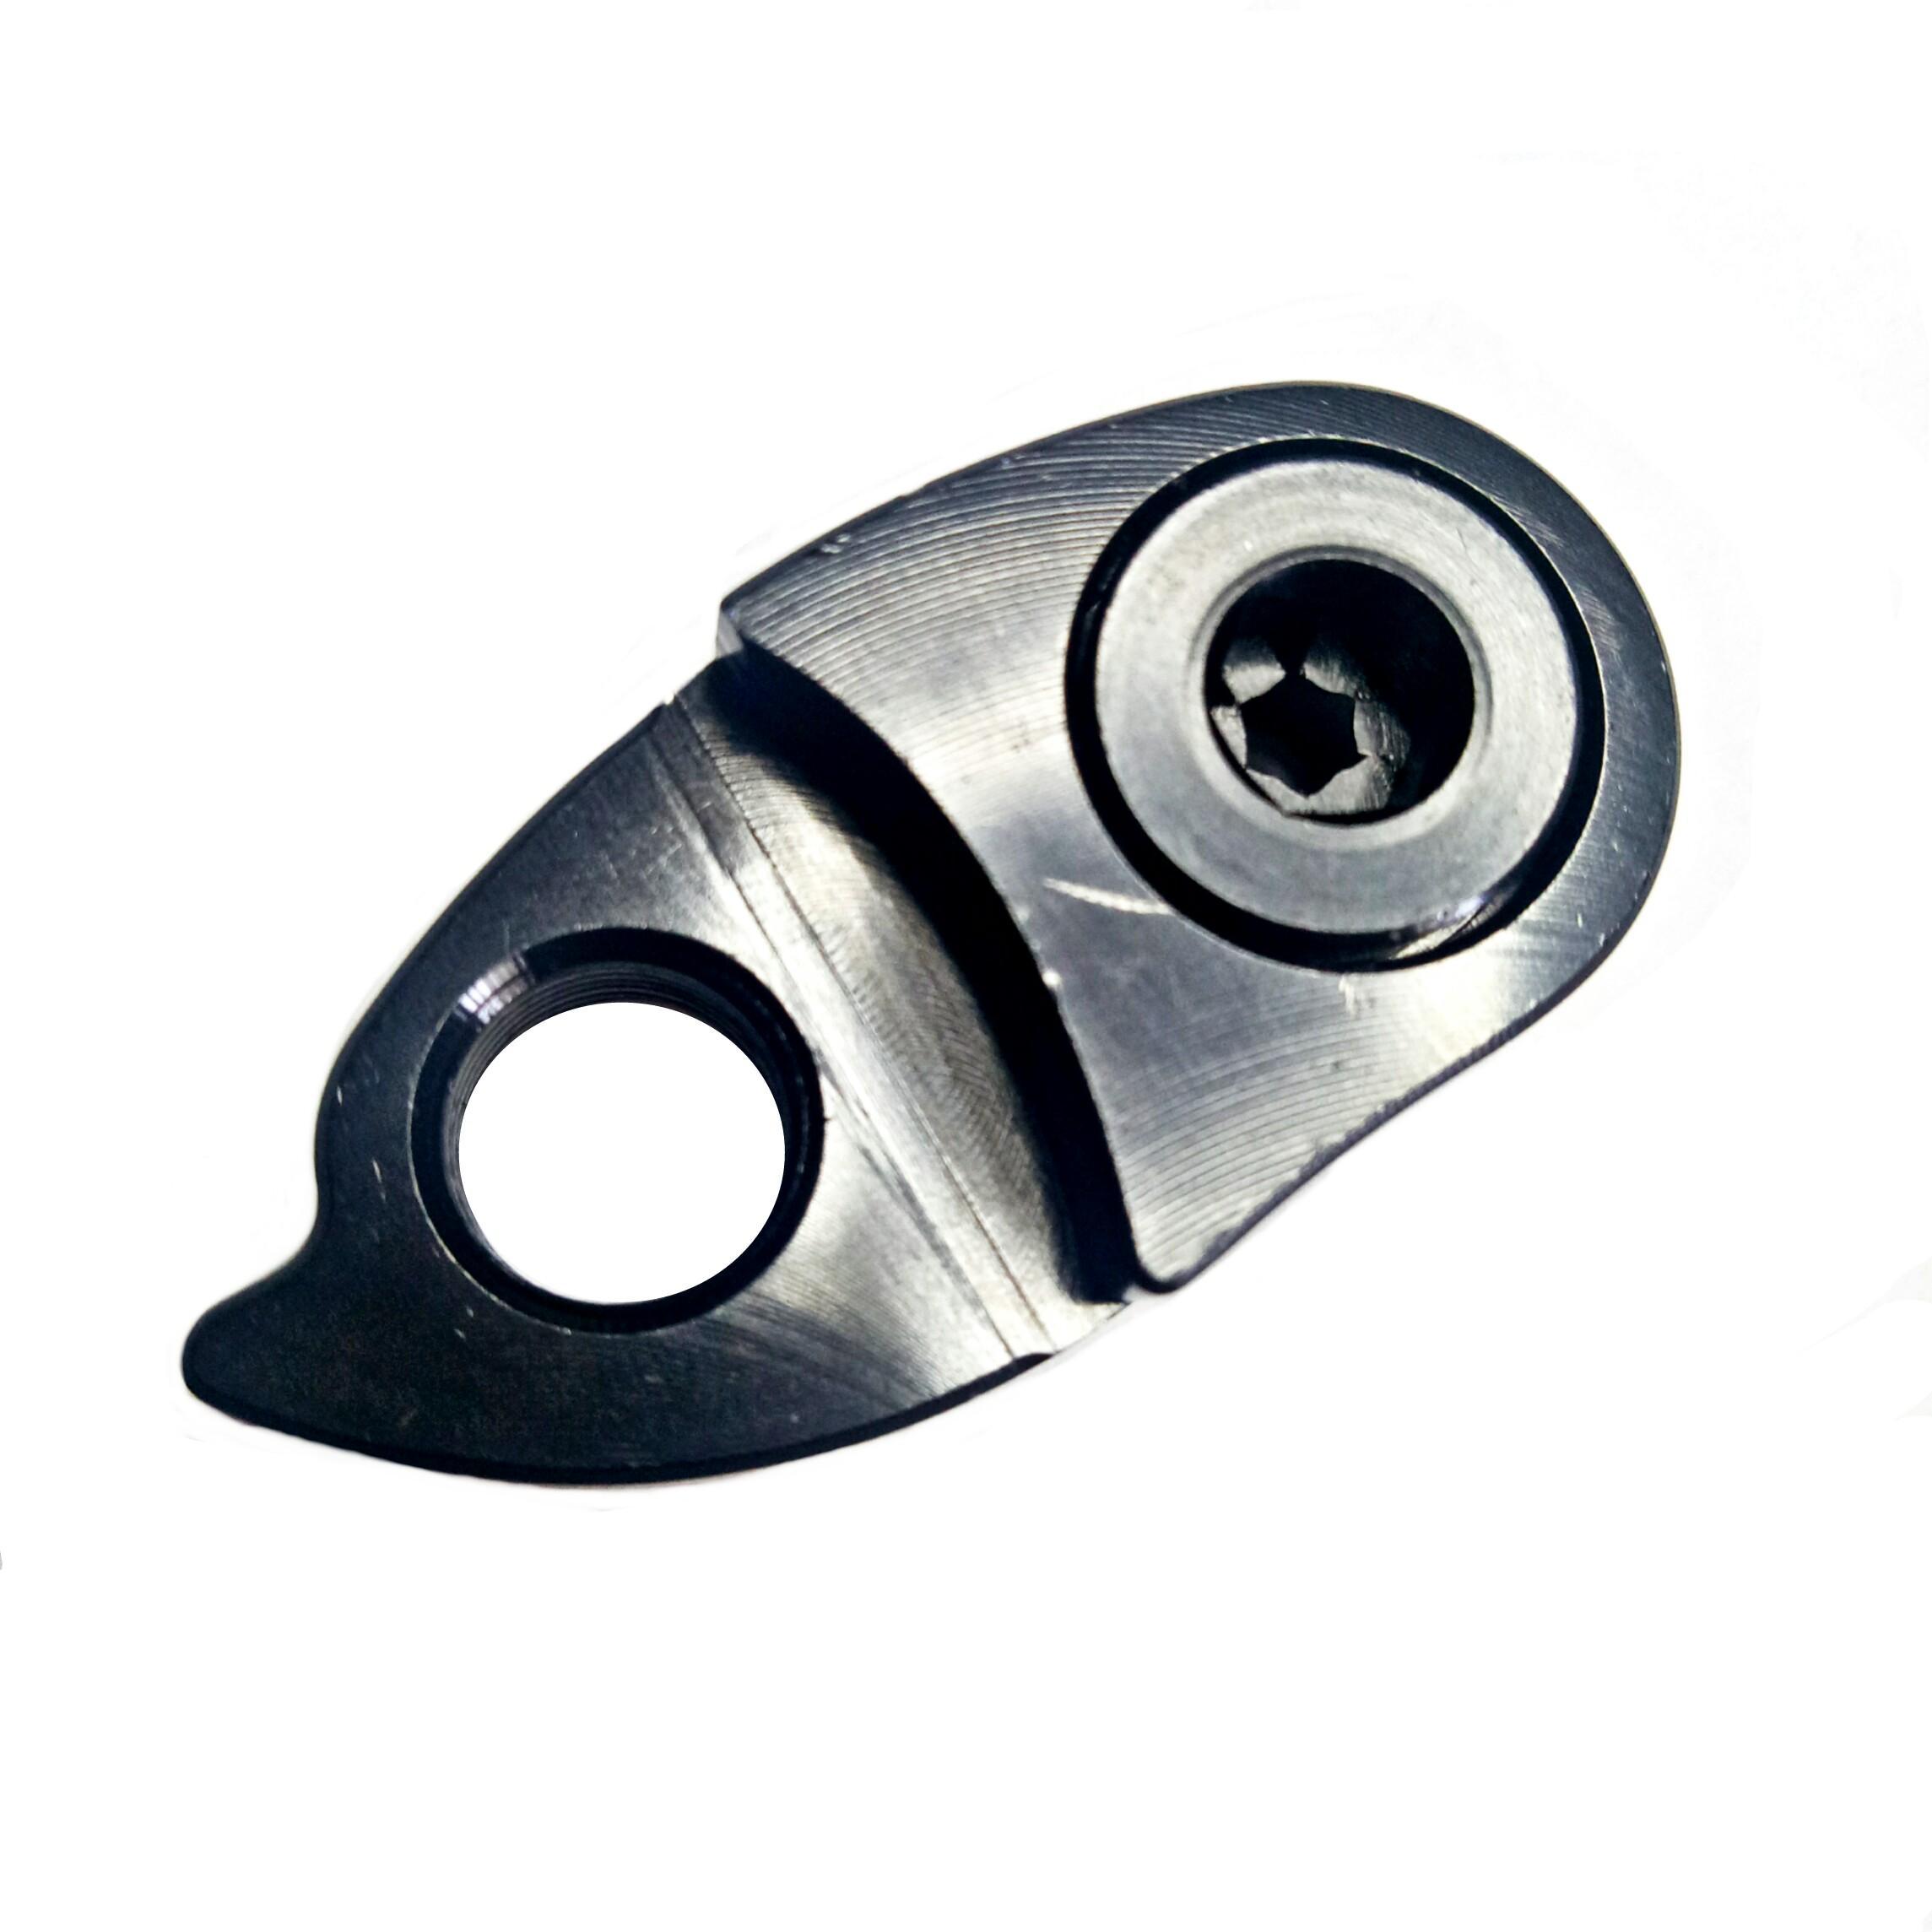 2//4PCS Bicycle Rear Derailleur Hanger Extension Frame Gear Tail Hook Extender